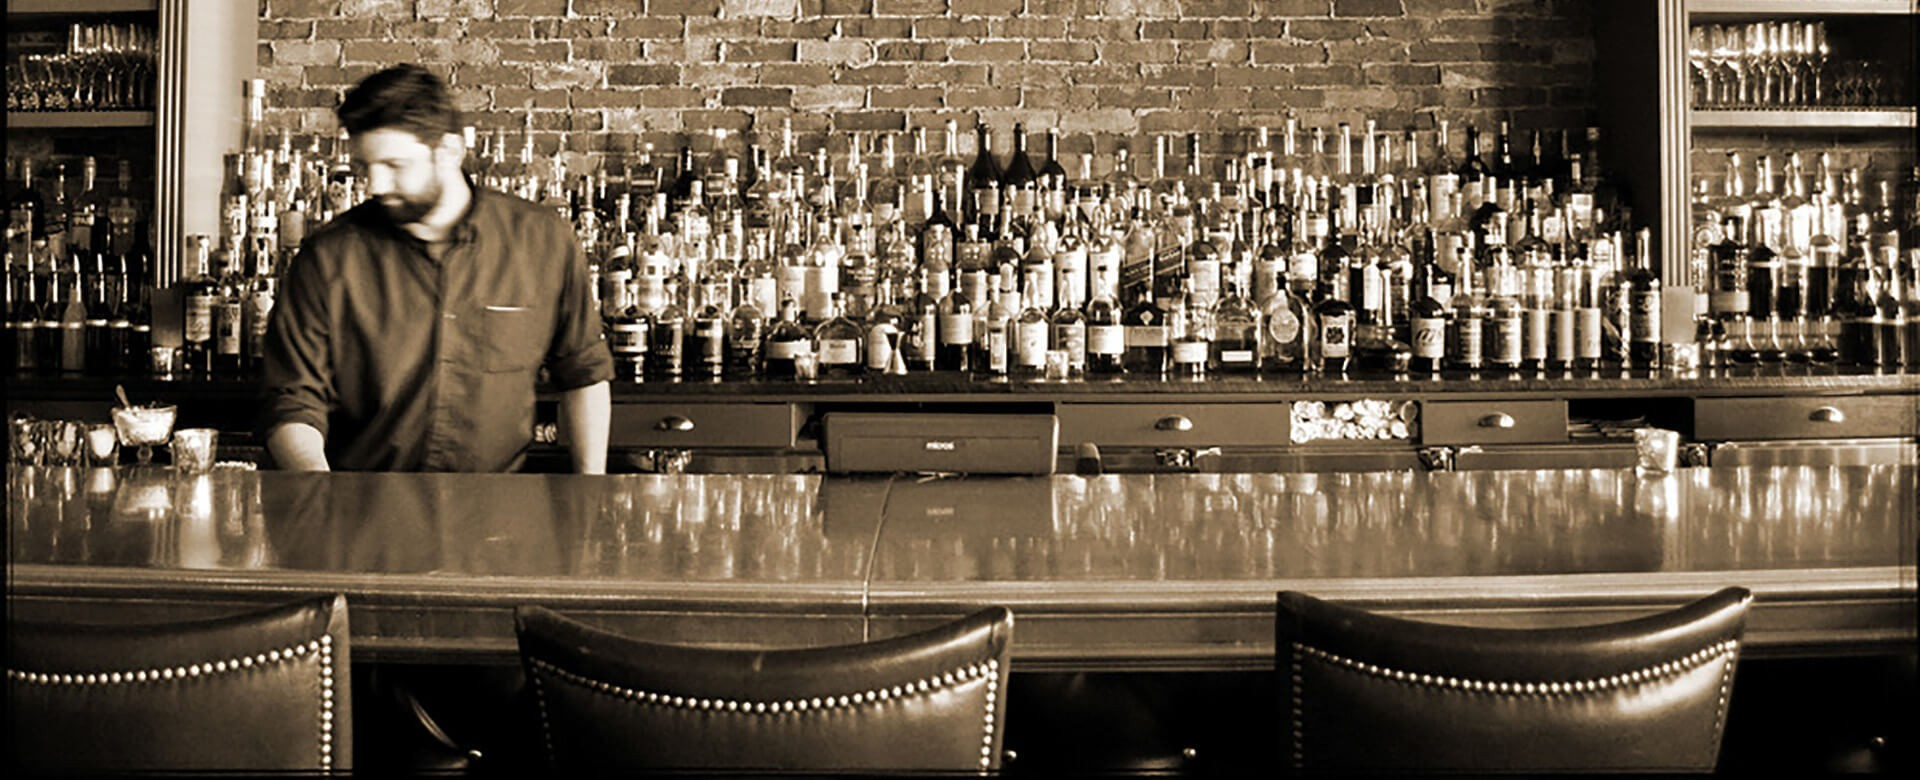 Speciale bartender